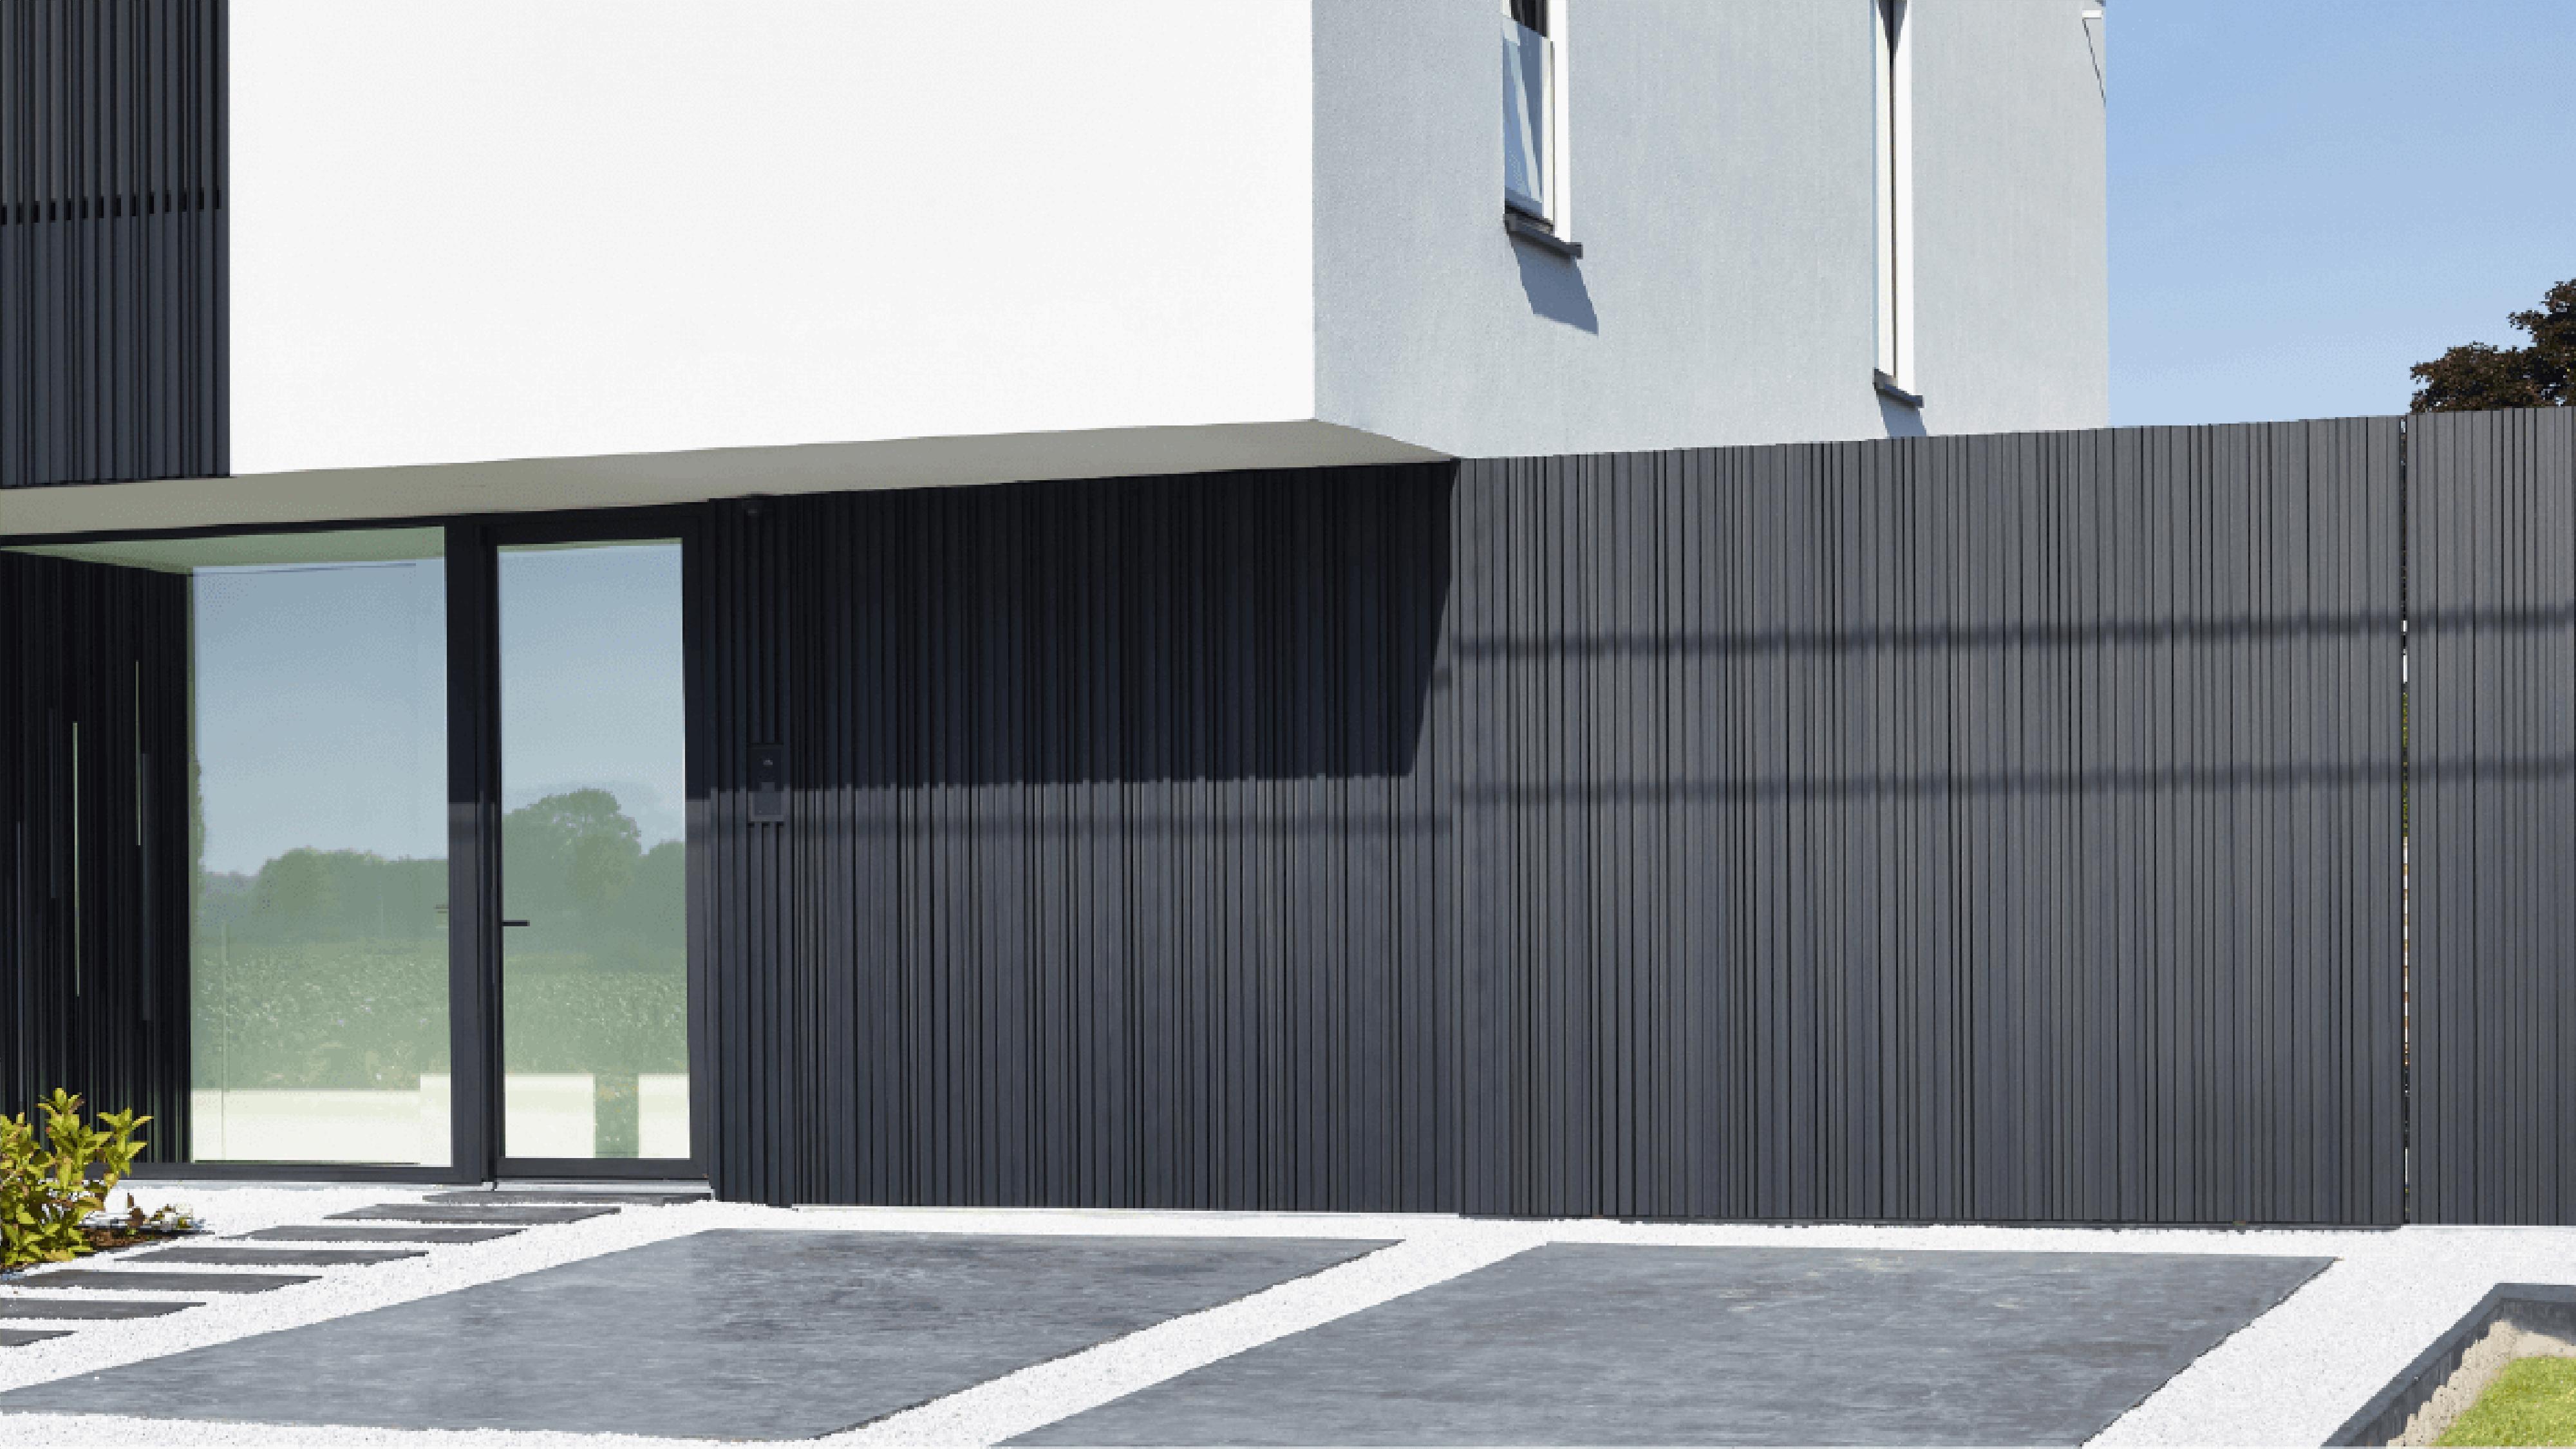 Alu-Wall Schuifpoort Aluminium Profielen